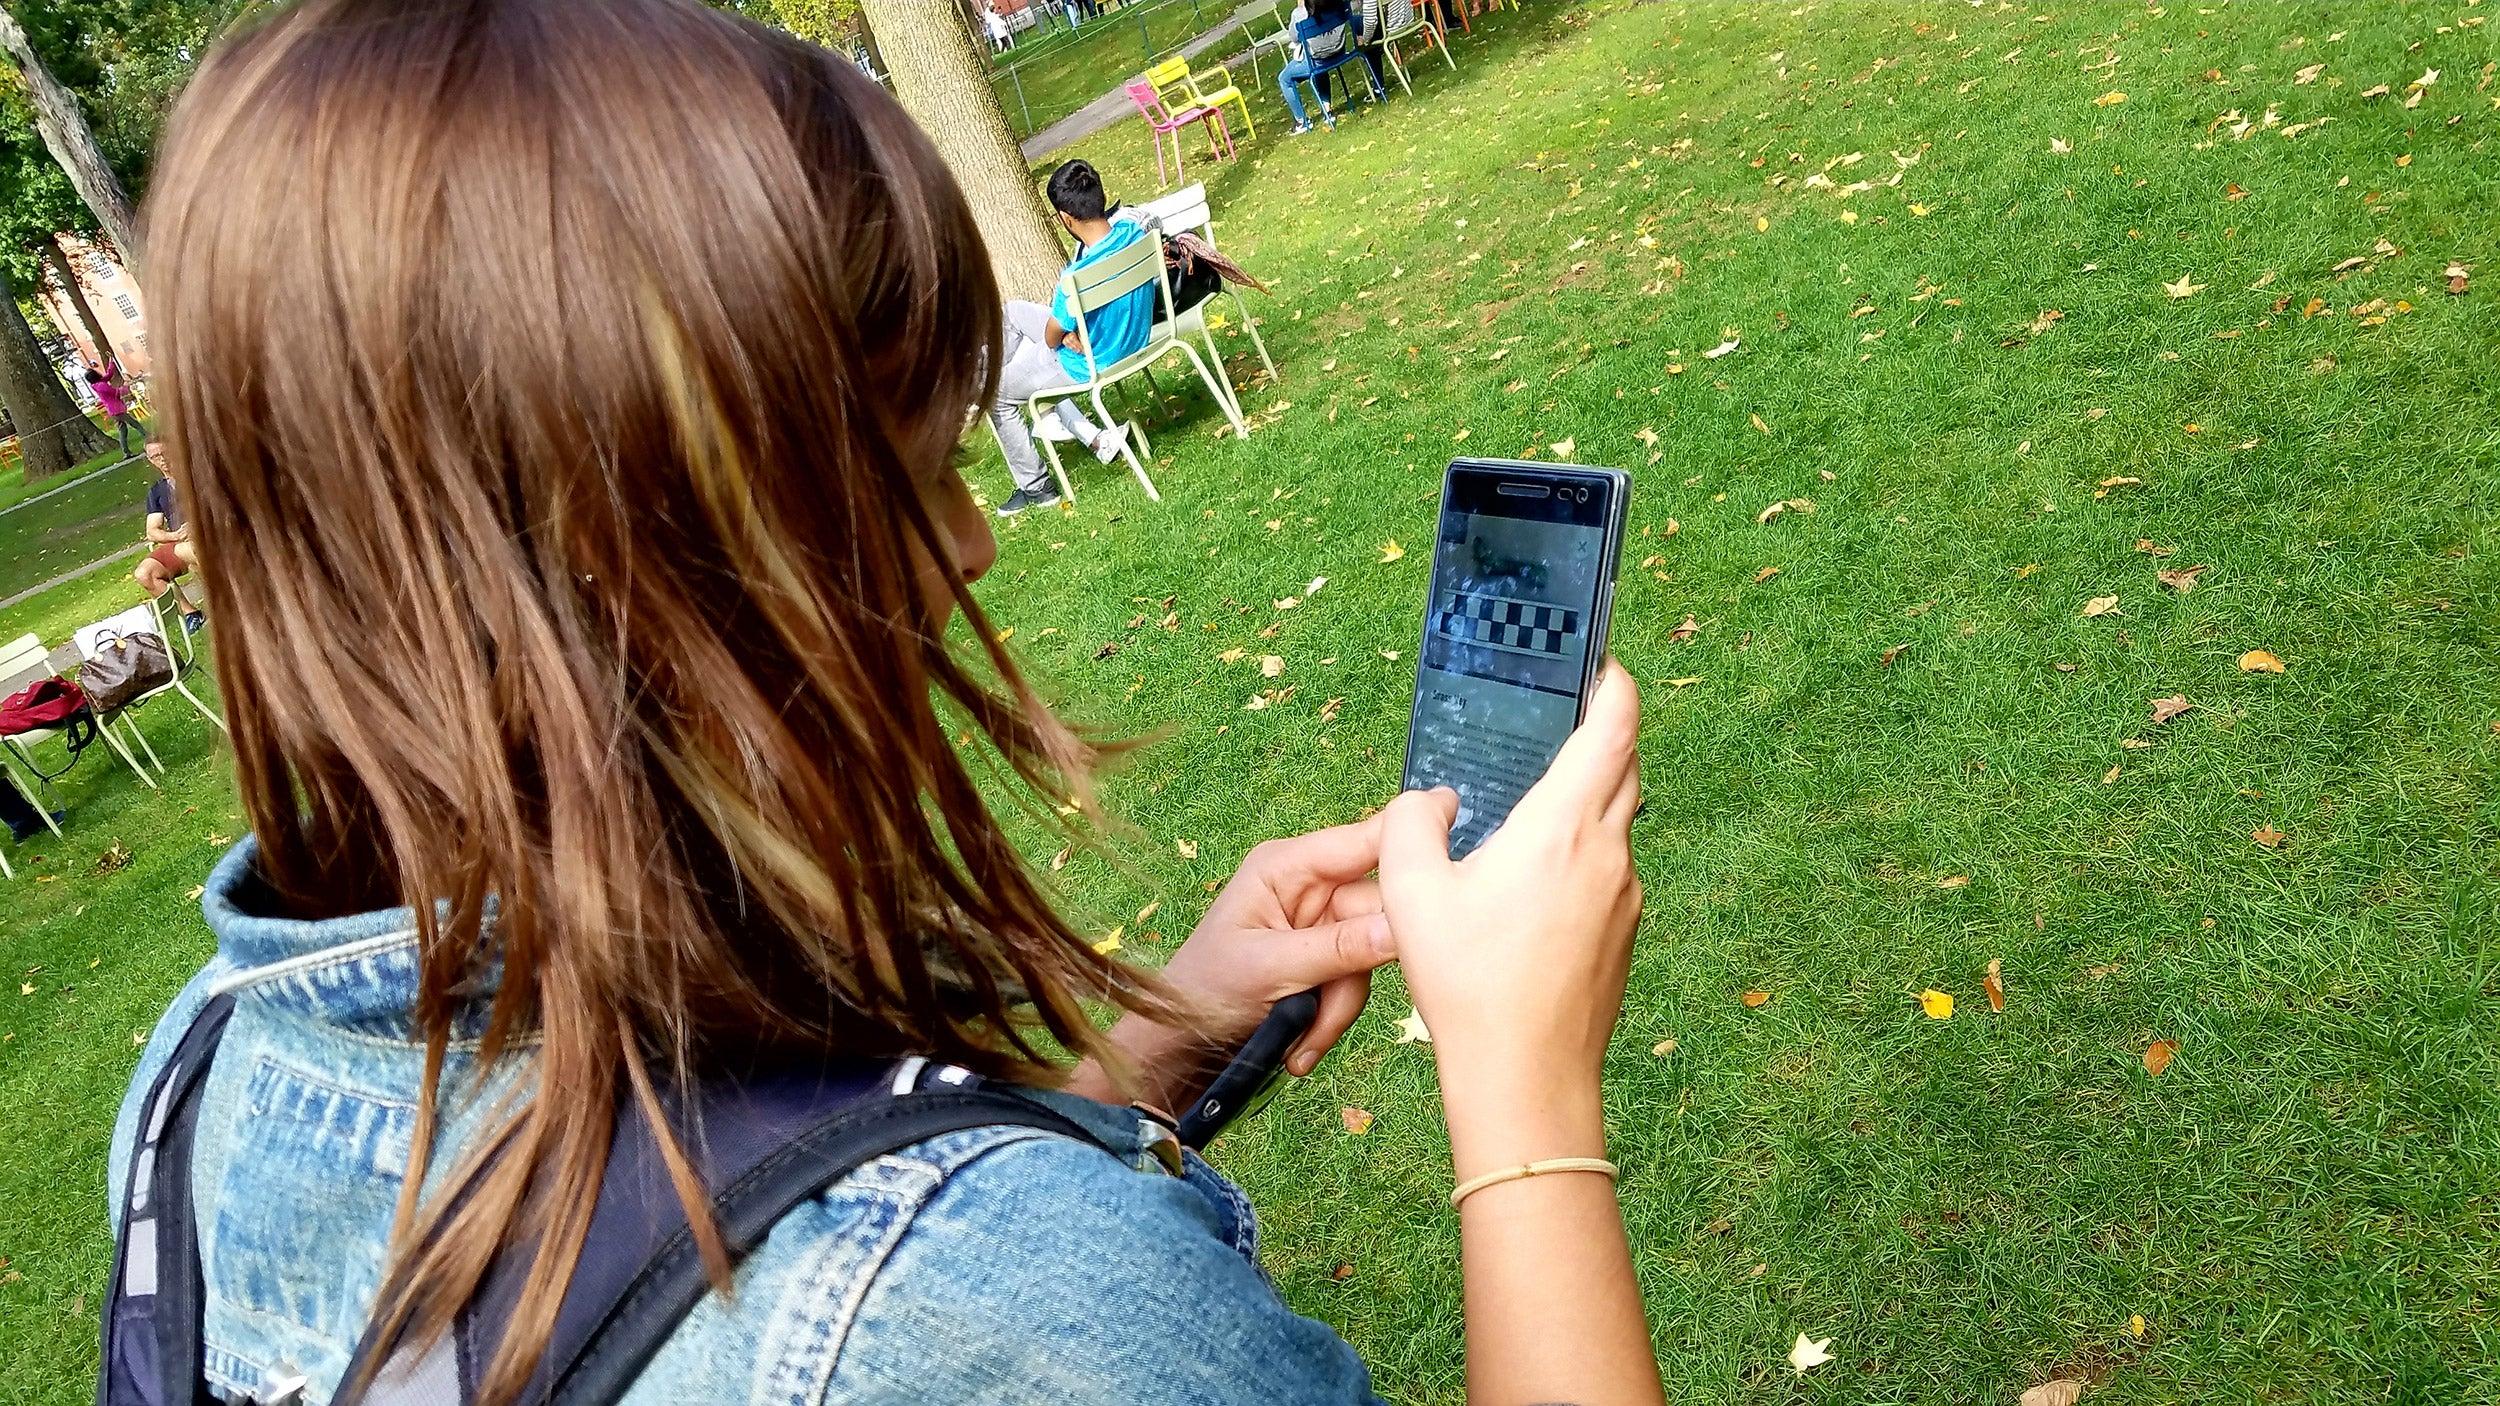 Harvard student Alexis Hartford tests the app